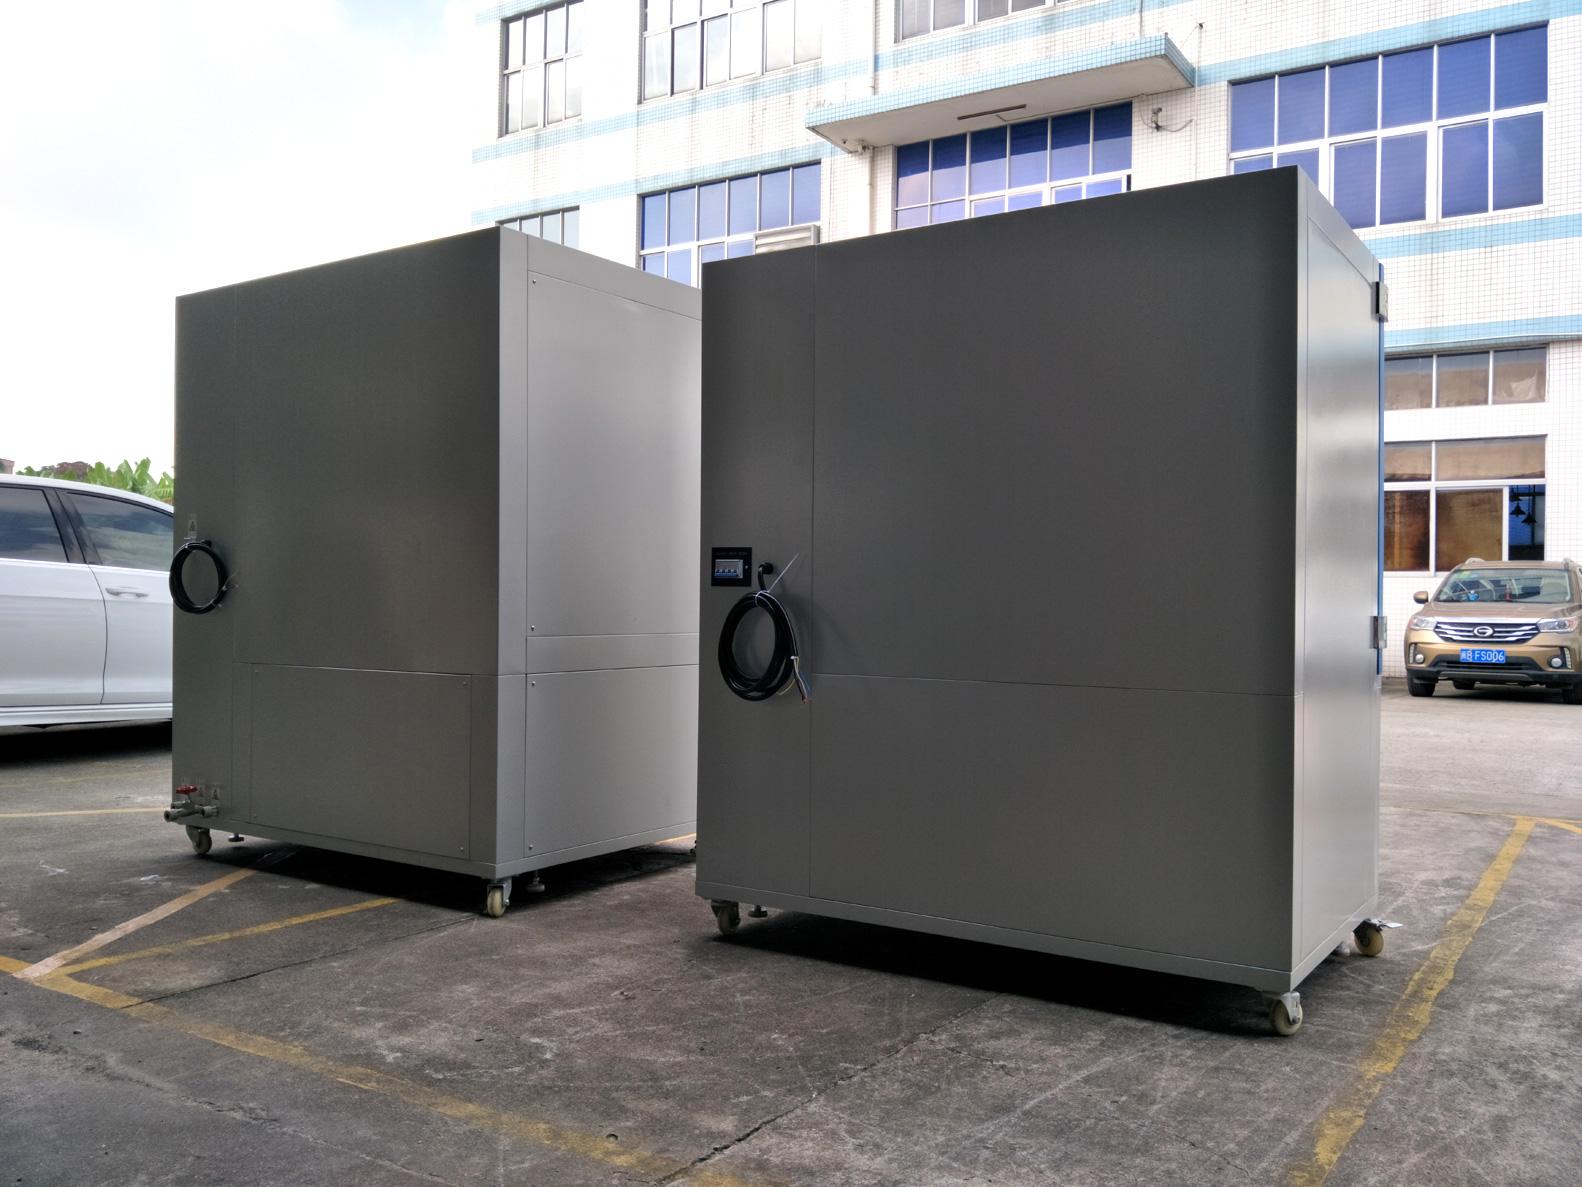 JIS D 0203 Rain Spray Test Chamber